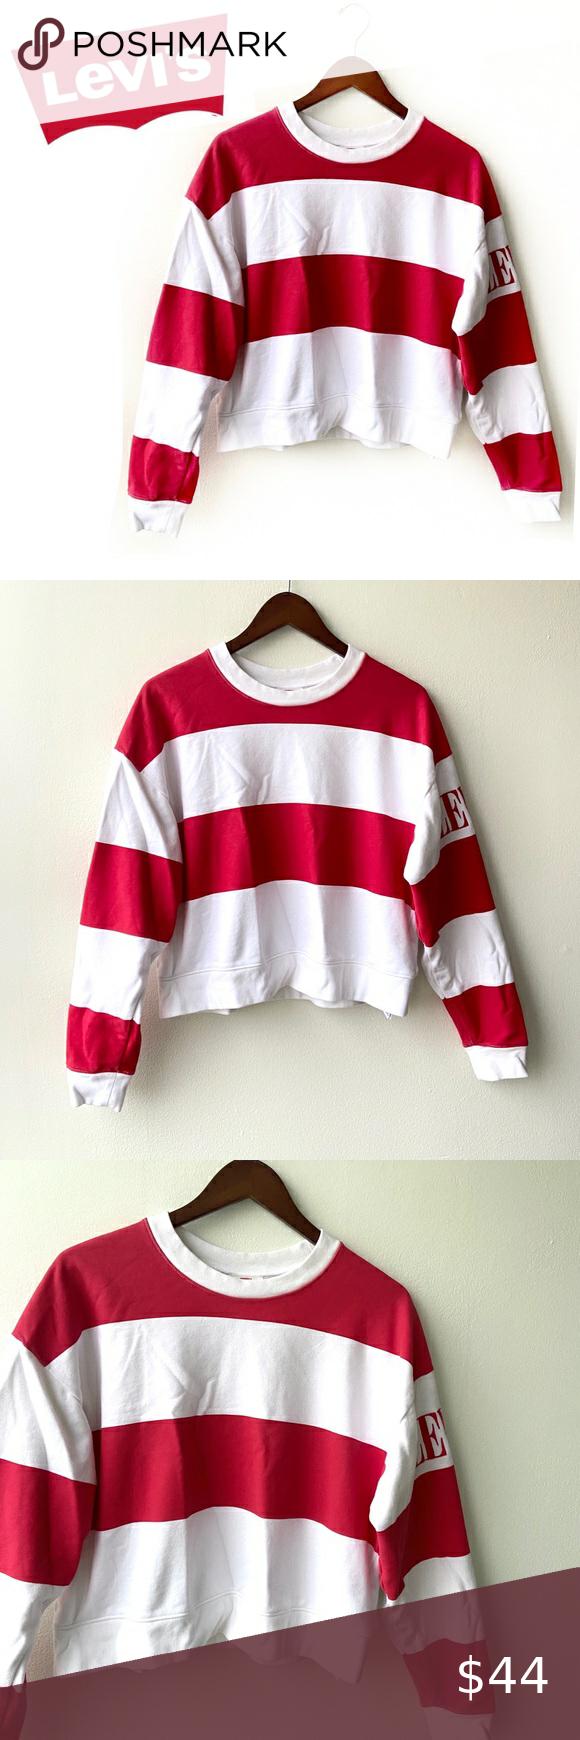 Levi S Red Stripe Diana Crew Neck Sweatshirt Levi S Red Stripe Diana Crew Neck Sweatshirt Red White Stri Sweatshirts Crop Top Sweatshirt Crew Neck Sweatshirt